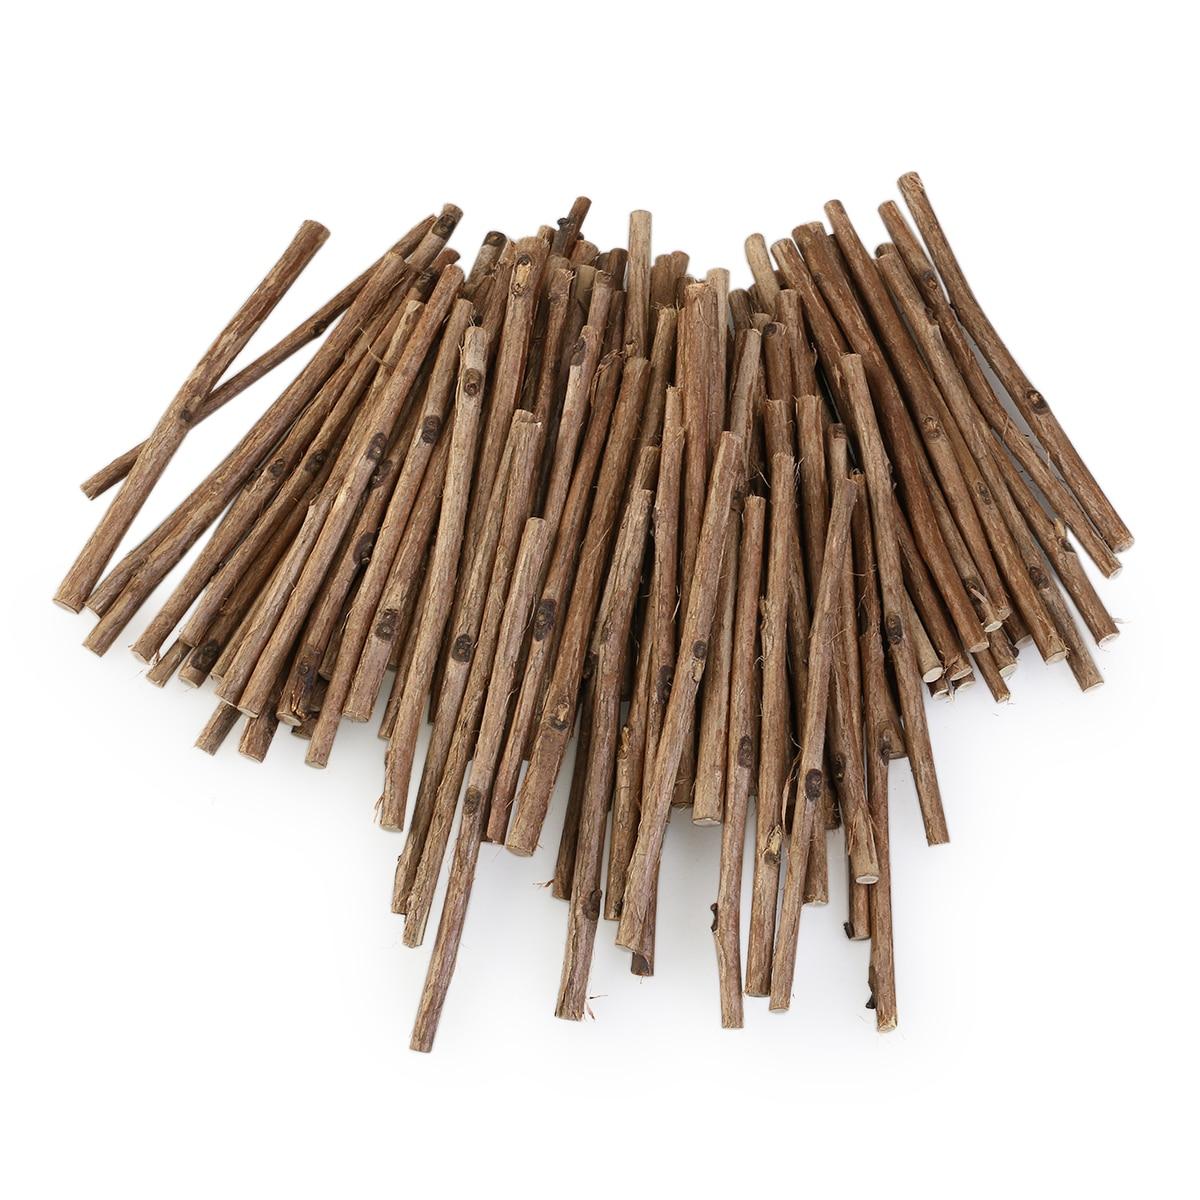 Decorative Logs For Garden